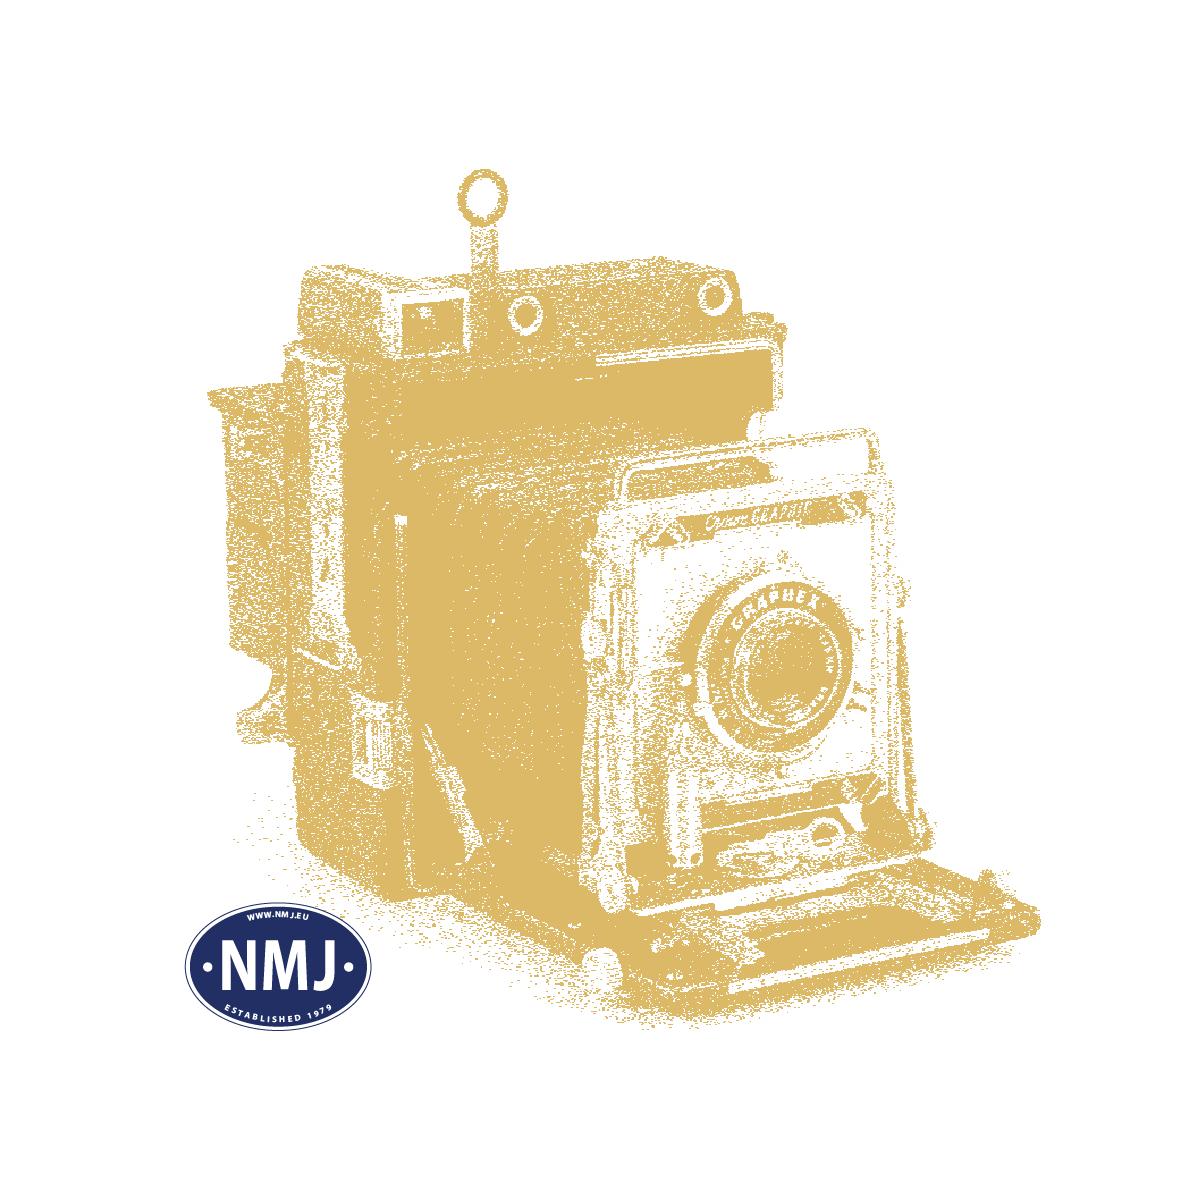 NMJS30b350 - NMJ Superline NSB Type 30b 350